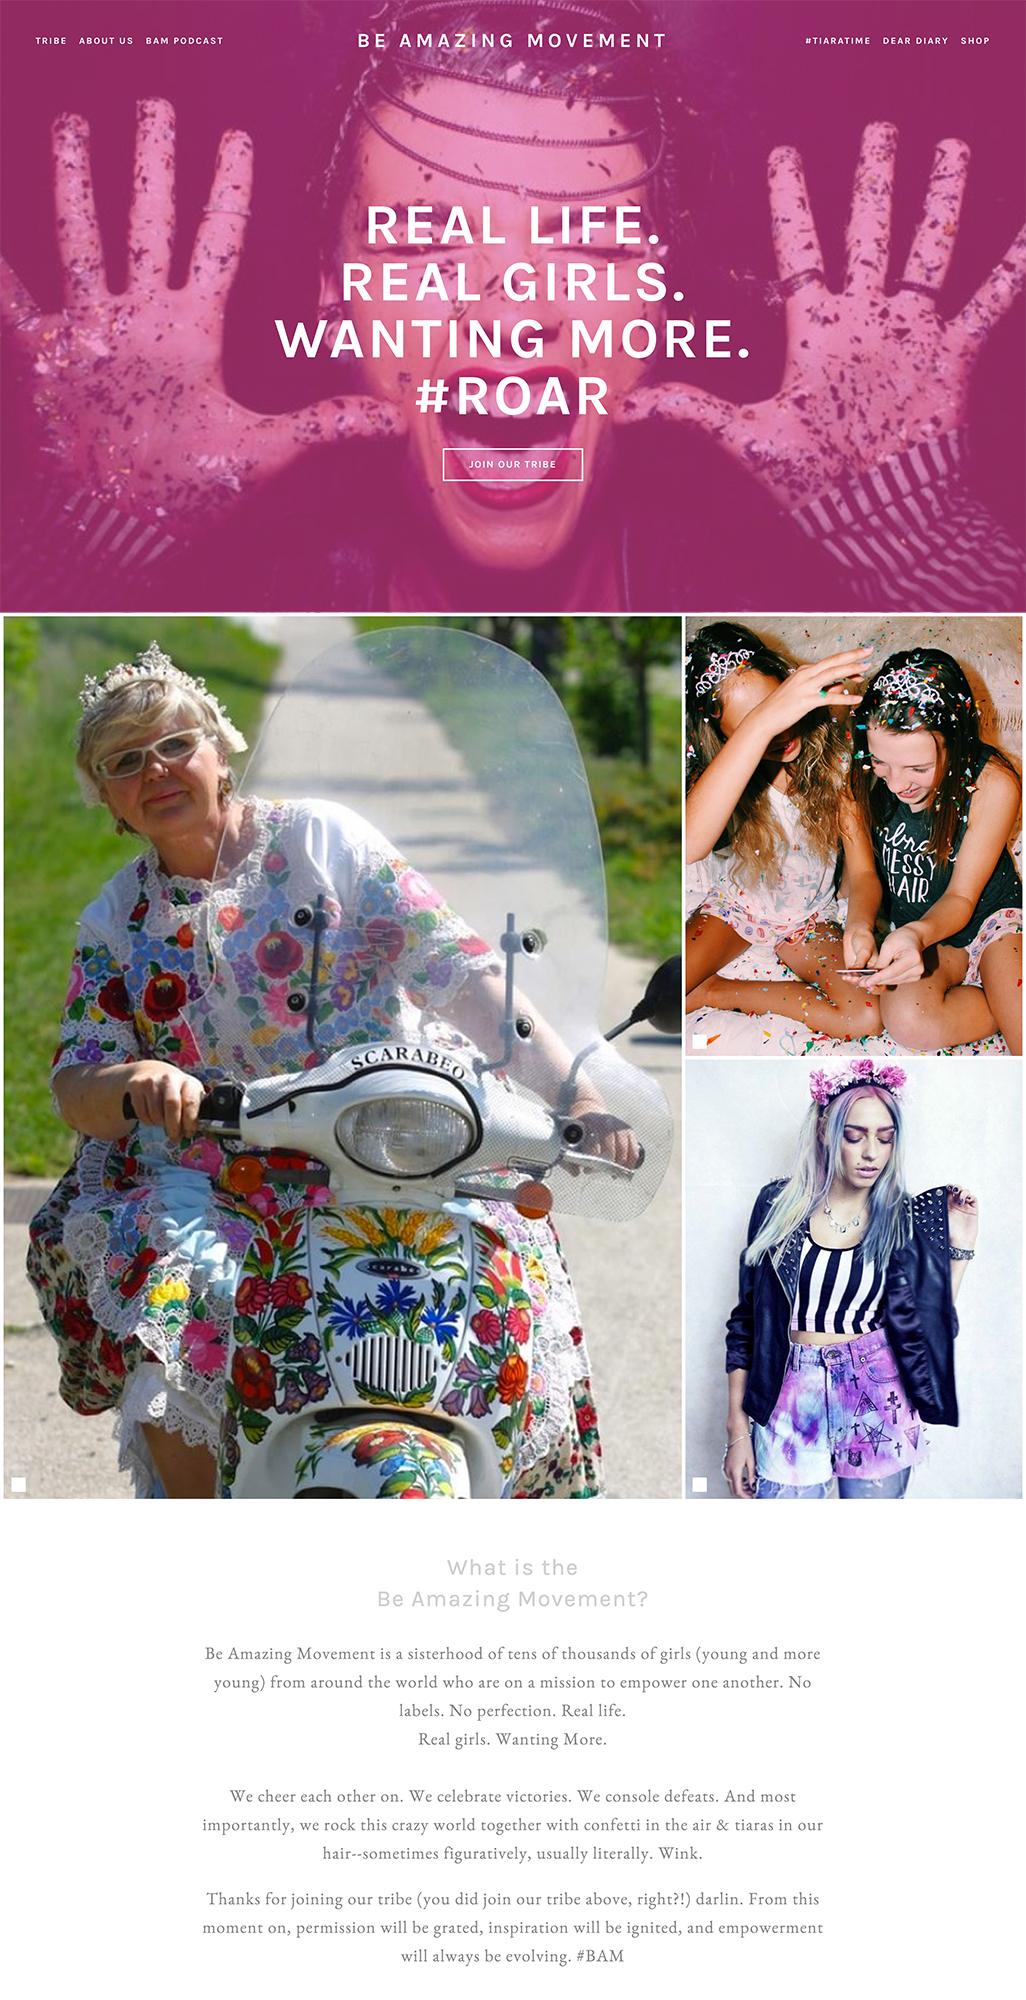 @beamazingmovement - Girl Tribe21.7k followers